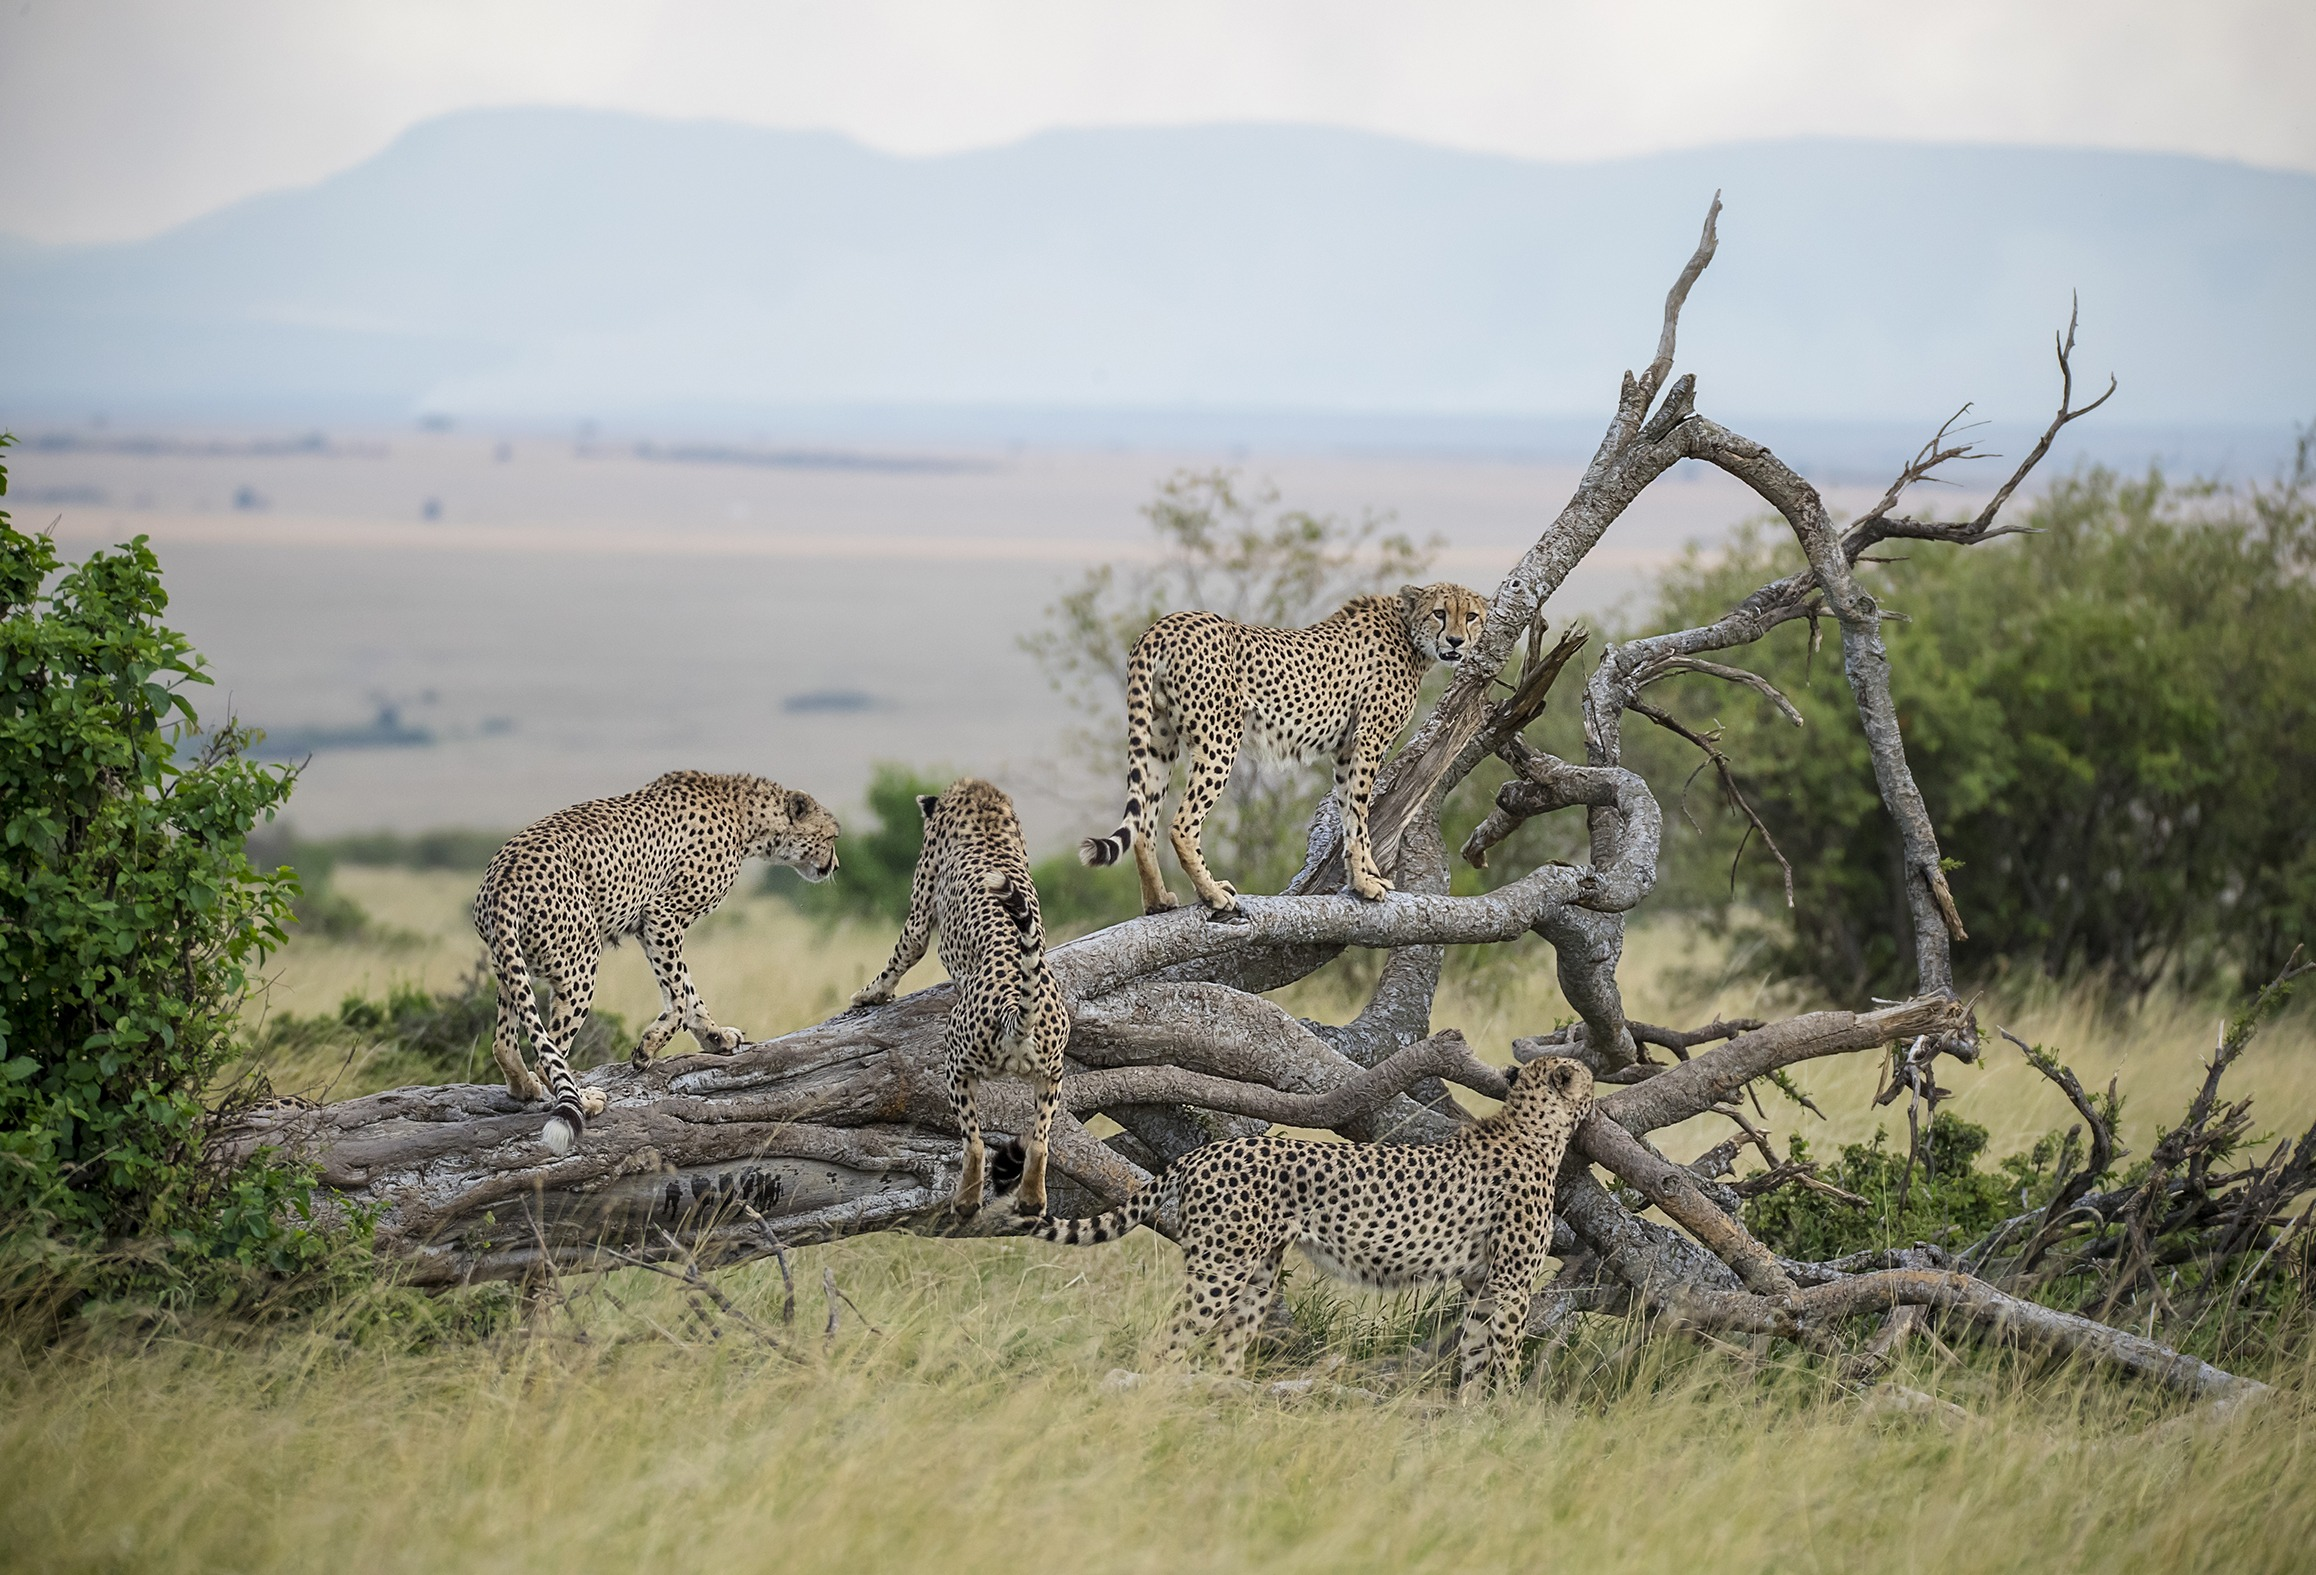 Fast Five / Tano Bora in Maasai Mara captured by Clement Kiragu